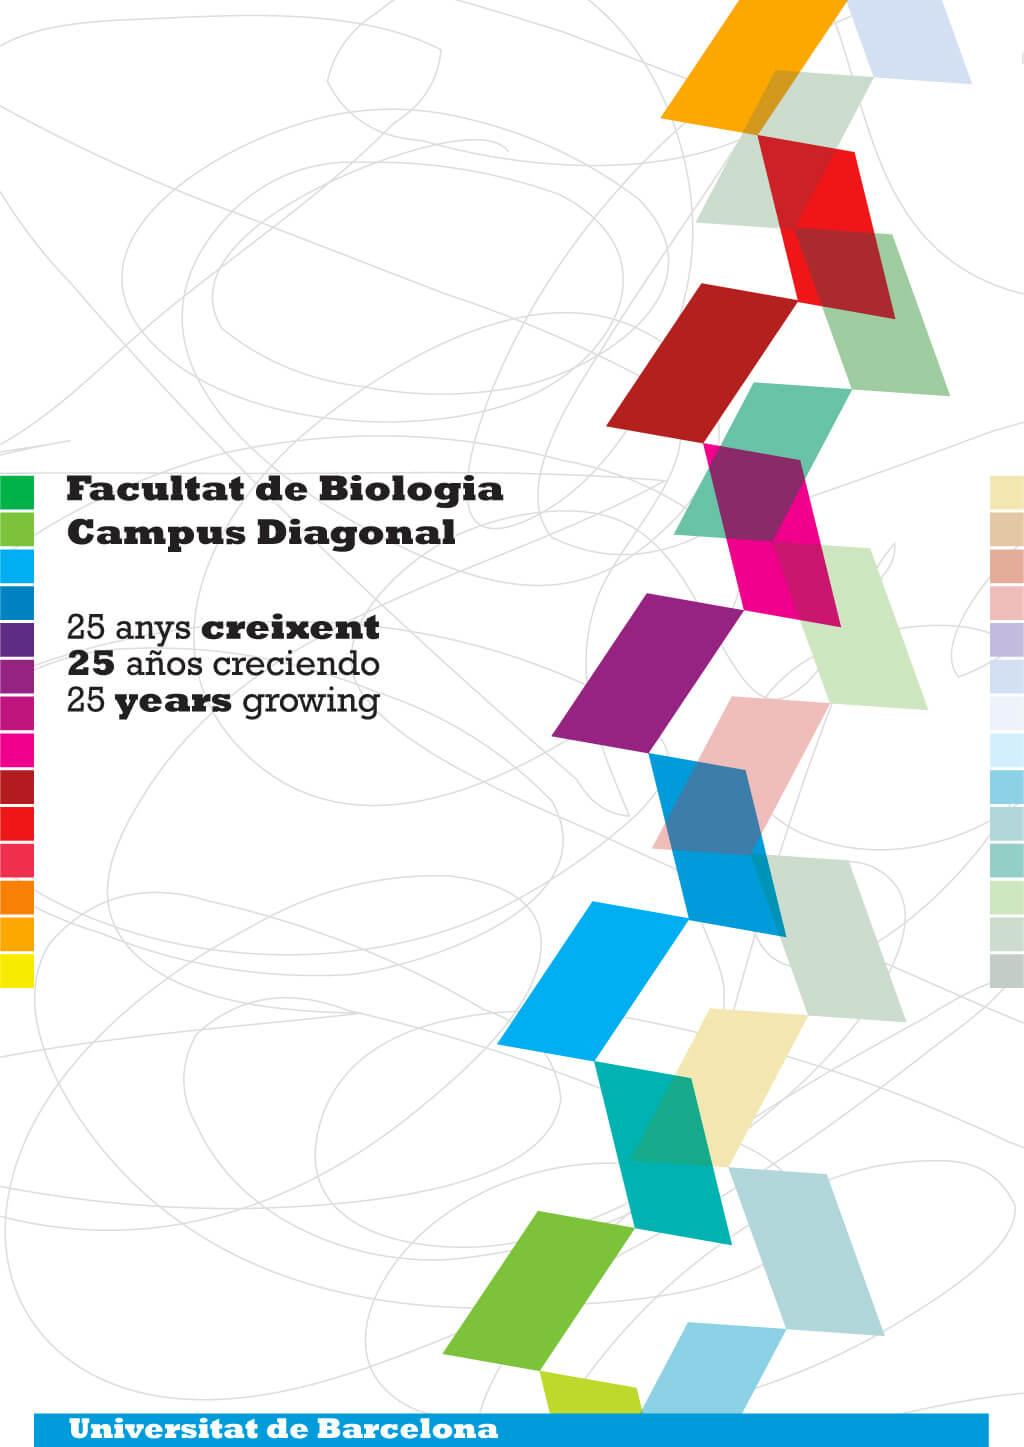 BIOLOGIA-POSTER-25YEARS.jpg